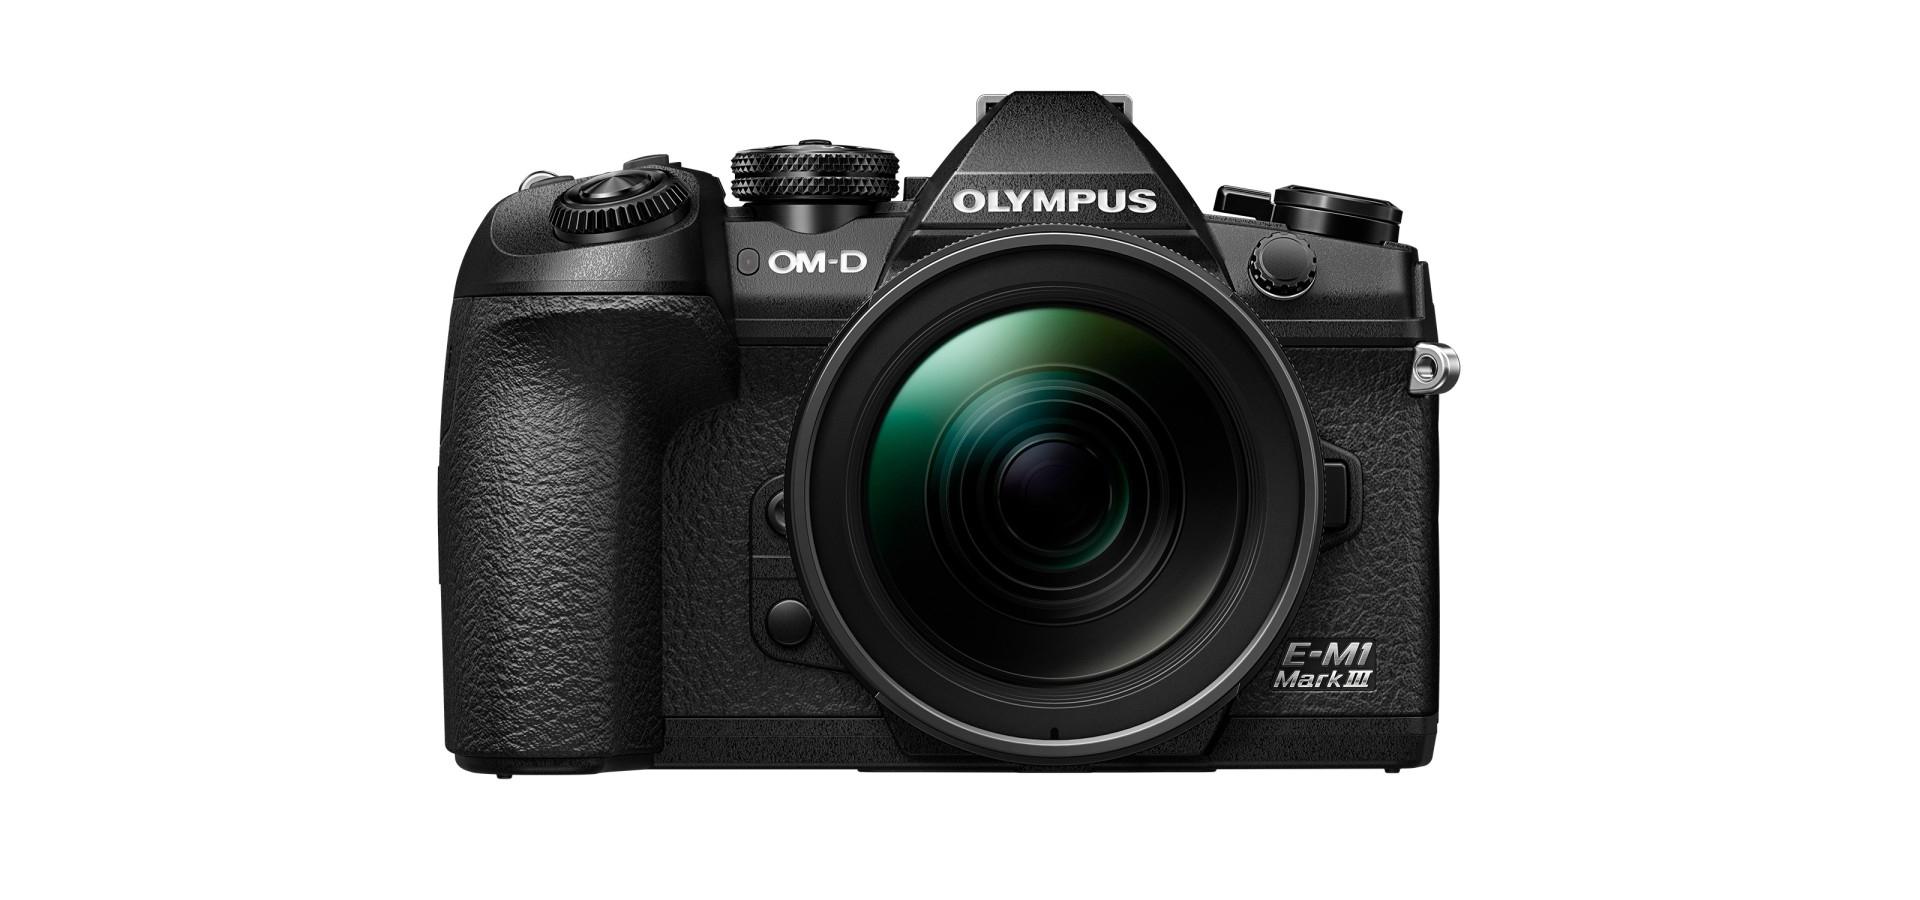 Olympus EMD Mark III - Nowosciproduktowe.pl-1